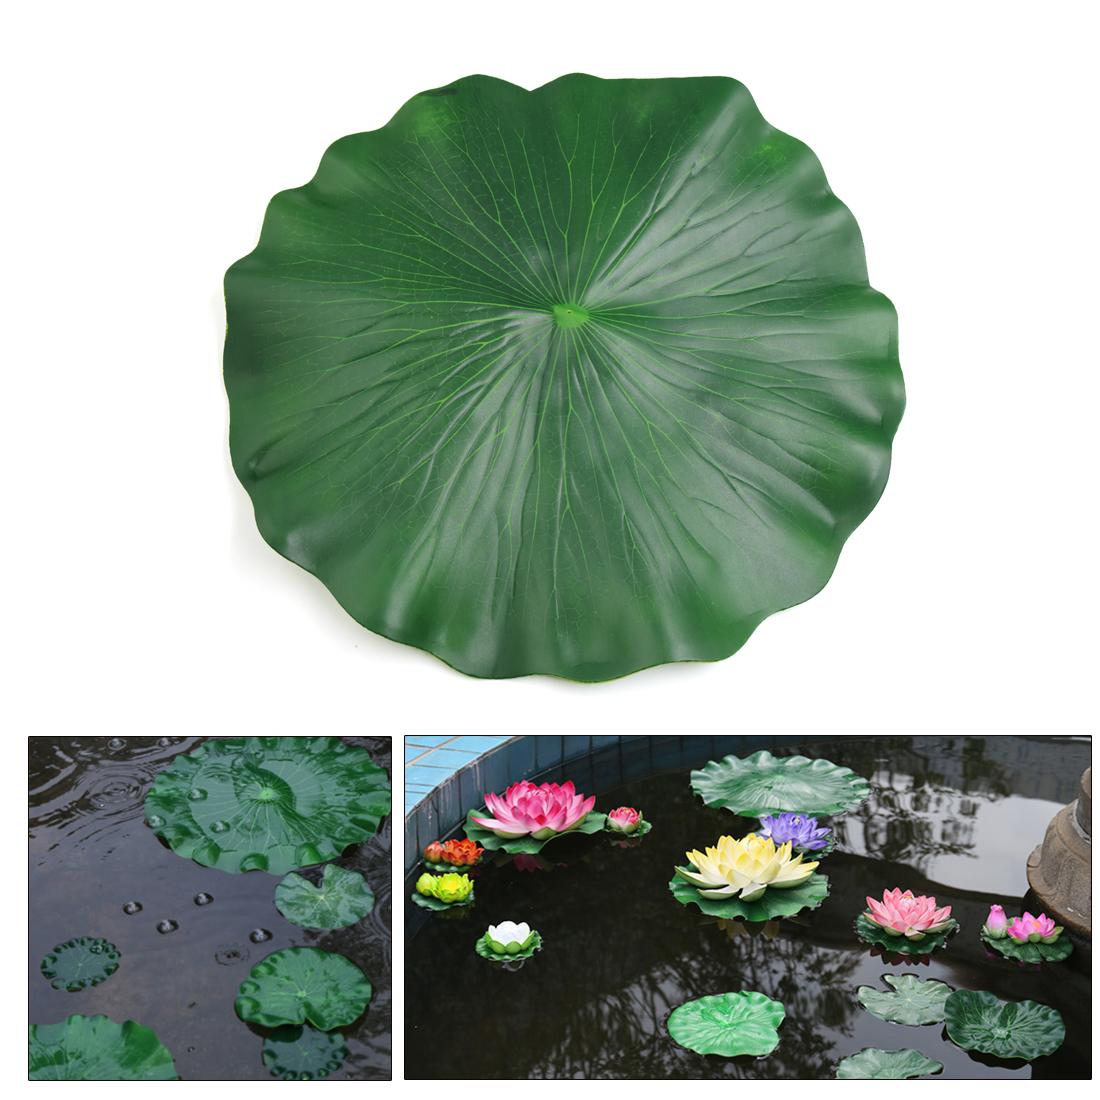 Green Foam Lotus Leaf Aquarium Pond Decor Floating Plant Ornament 60cm Diameter